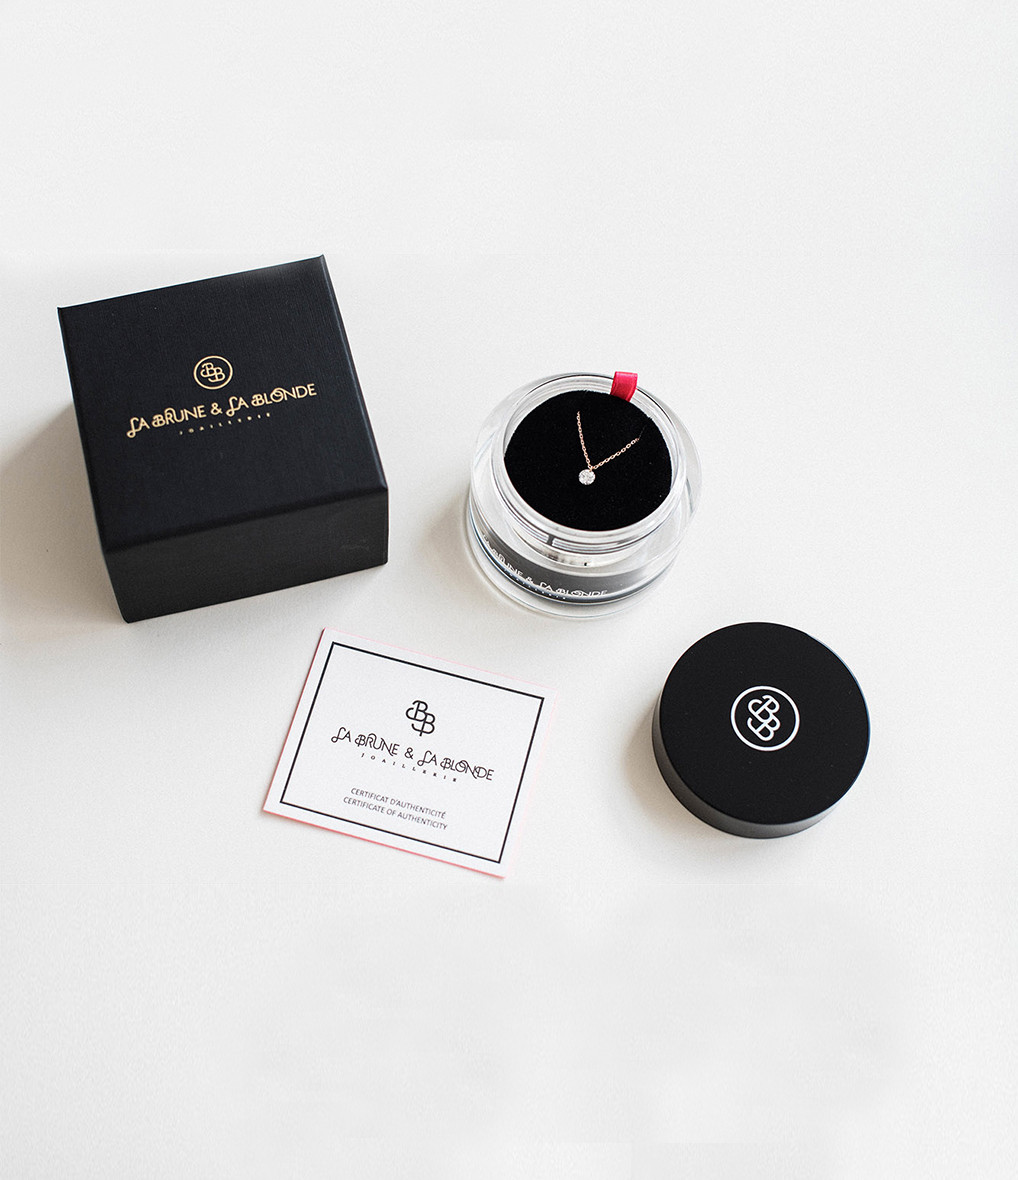 LA BRUNE & LA BLONDE - Créoles 360° Diamant Brillant Or Rose